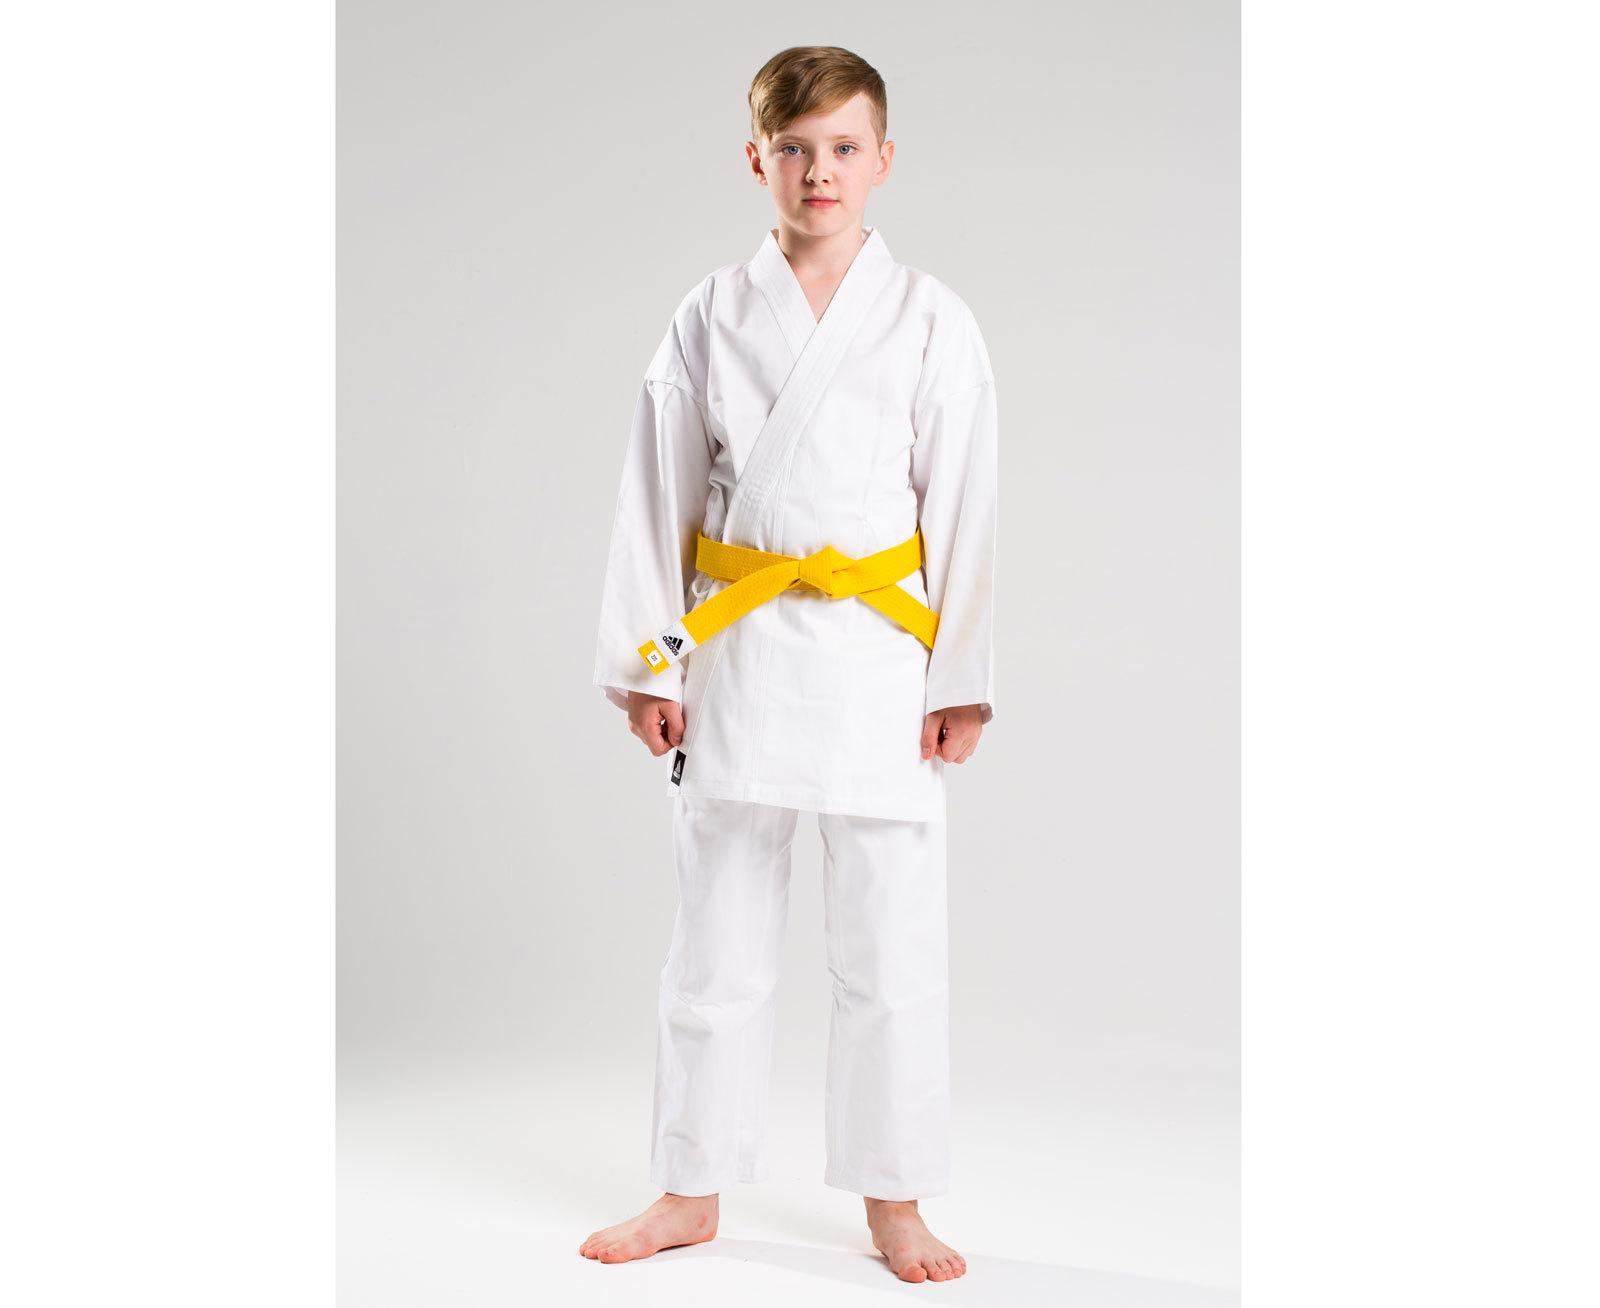 Кимоно КИМОНО ДЛЯ КАРАТЕ TRAINING БЕЛОЕ kimono_dlya_karate_training_beloe.jpg